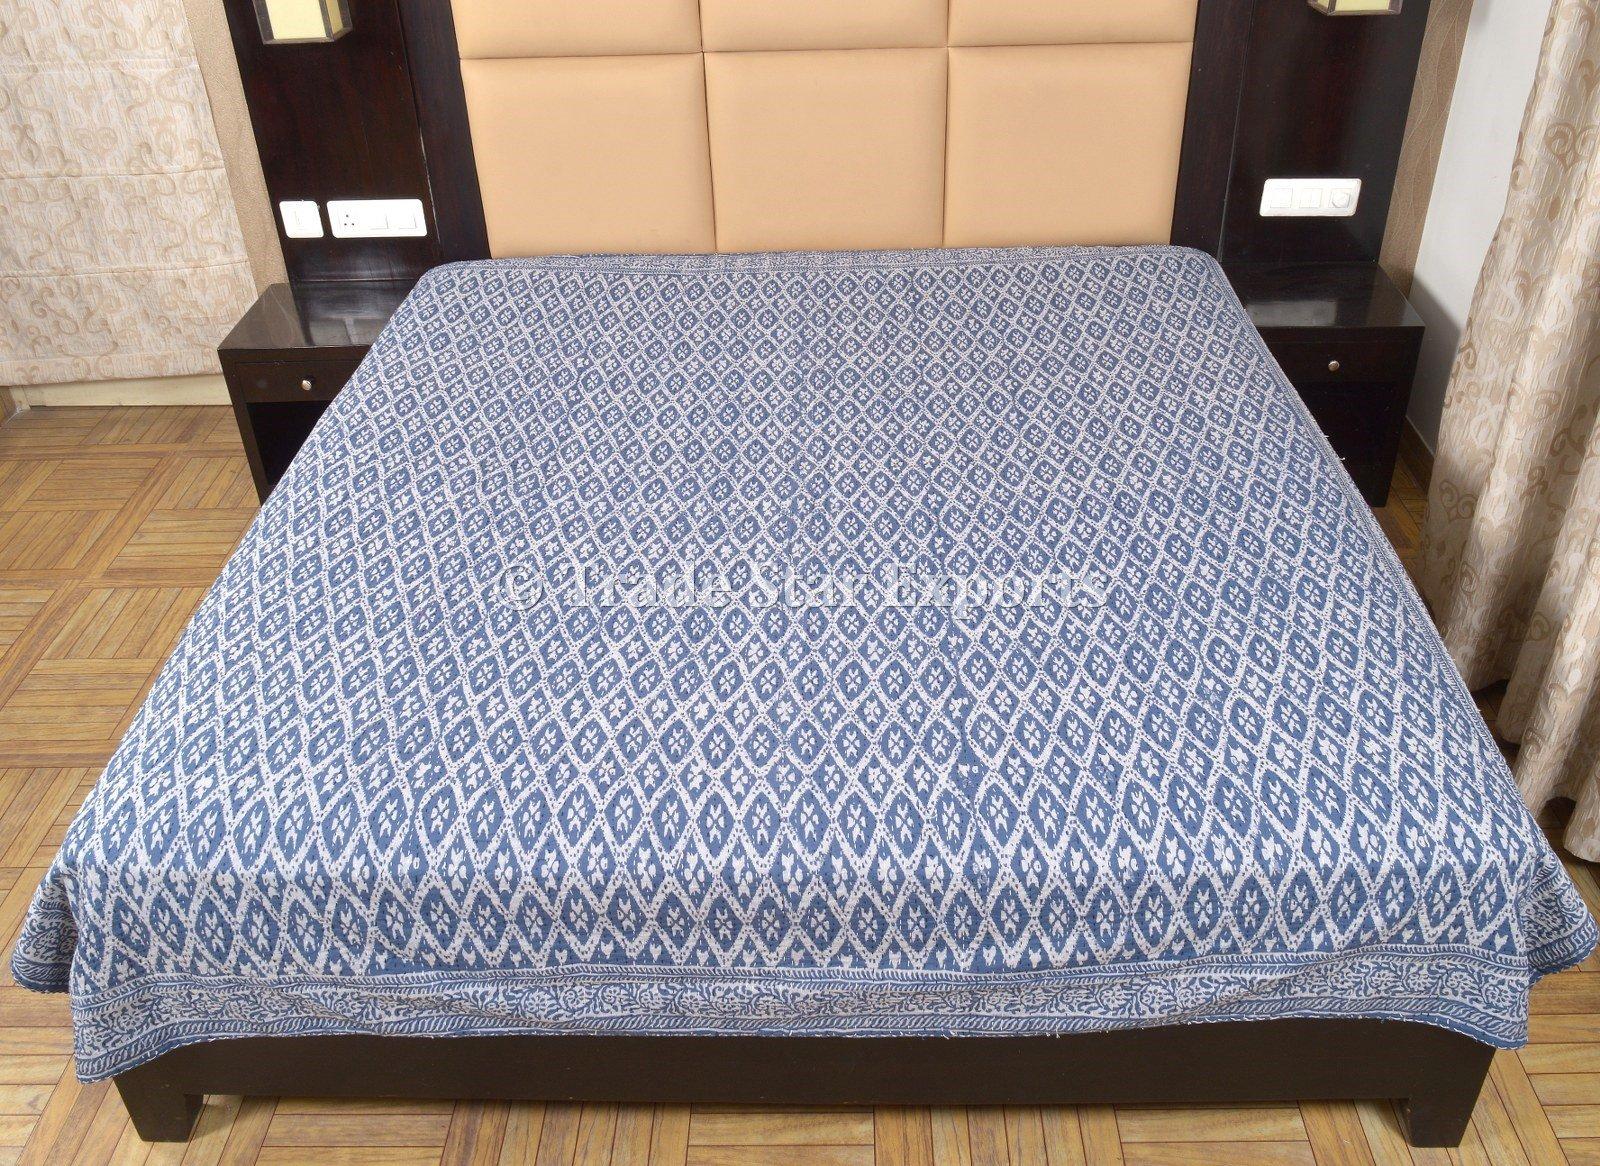 Block Print Fabric Kantha Throw, Indian Quilts Queen Size, Indigo Ikat Bedding, Boho Kantha Blanket, Handmade Quilted Bedspread